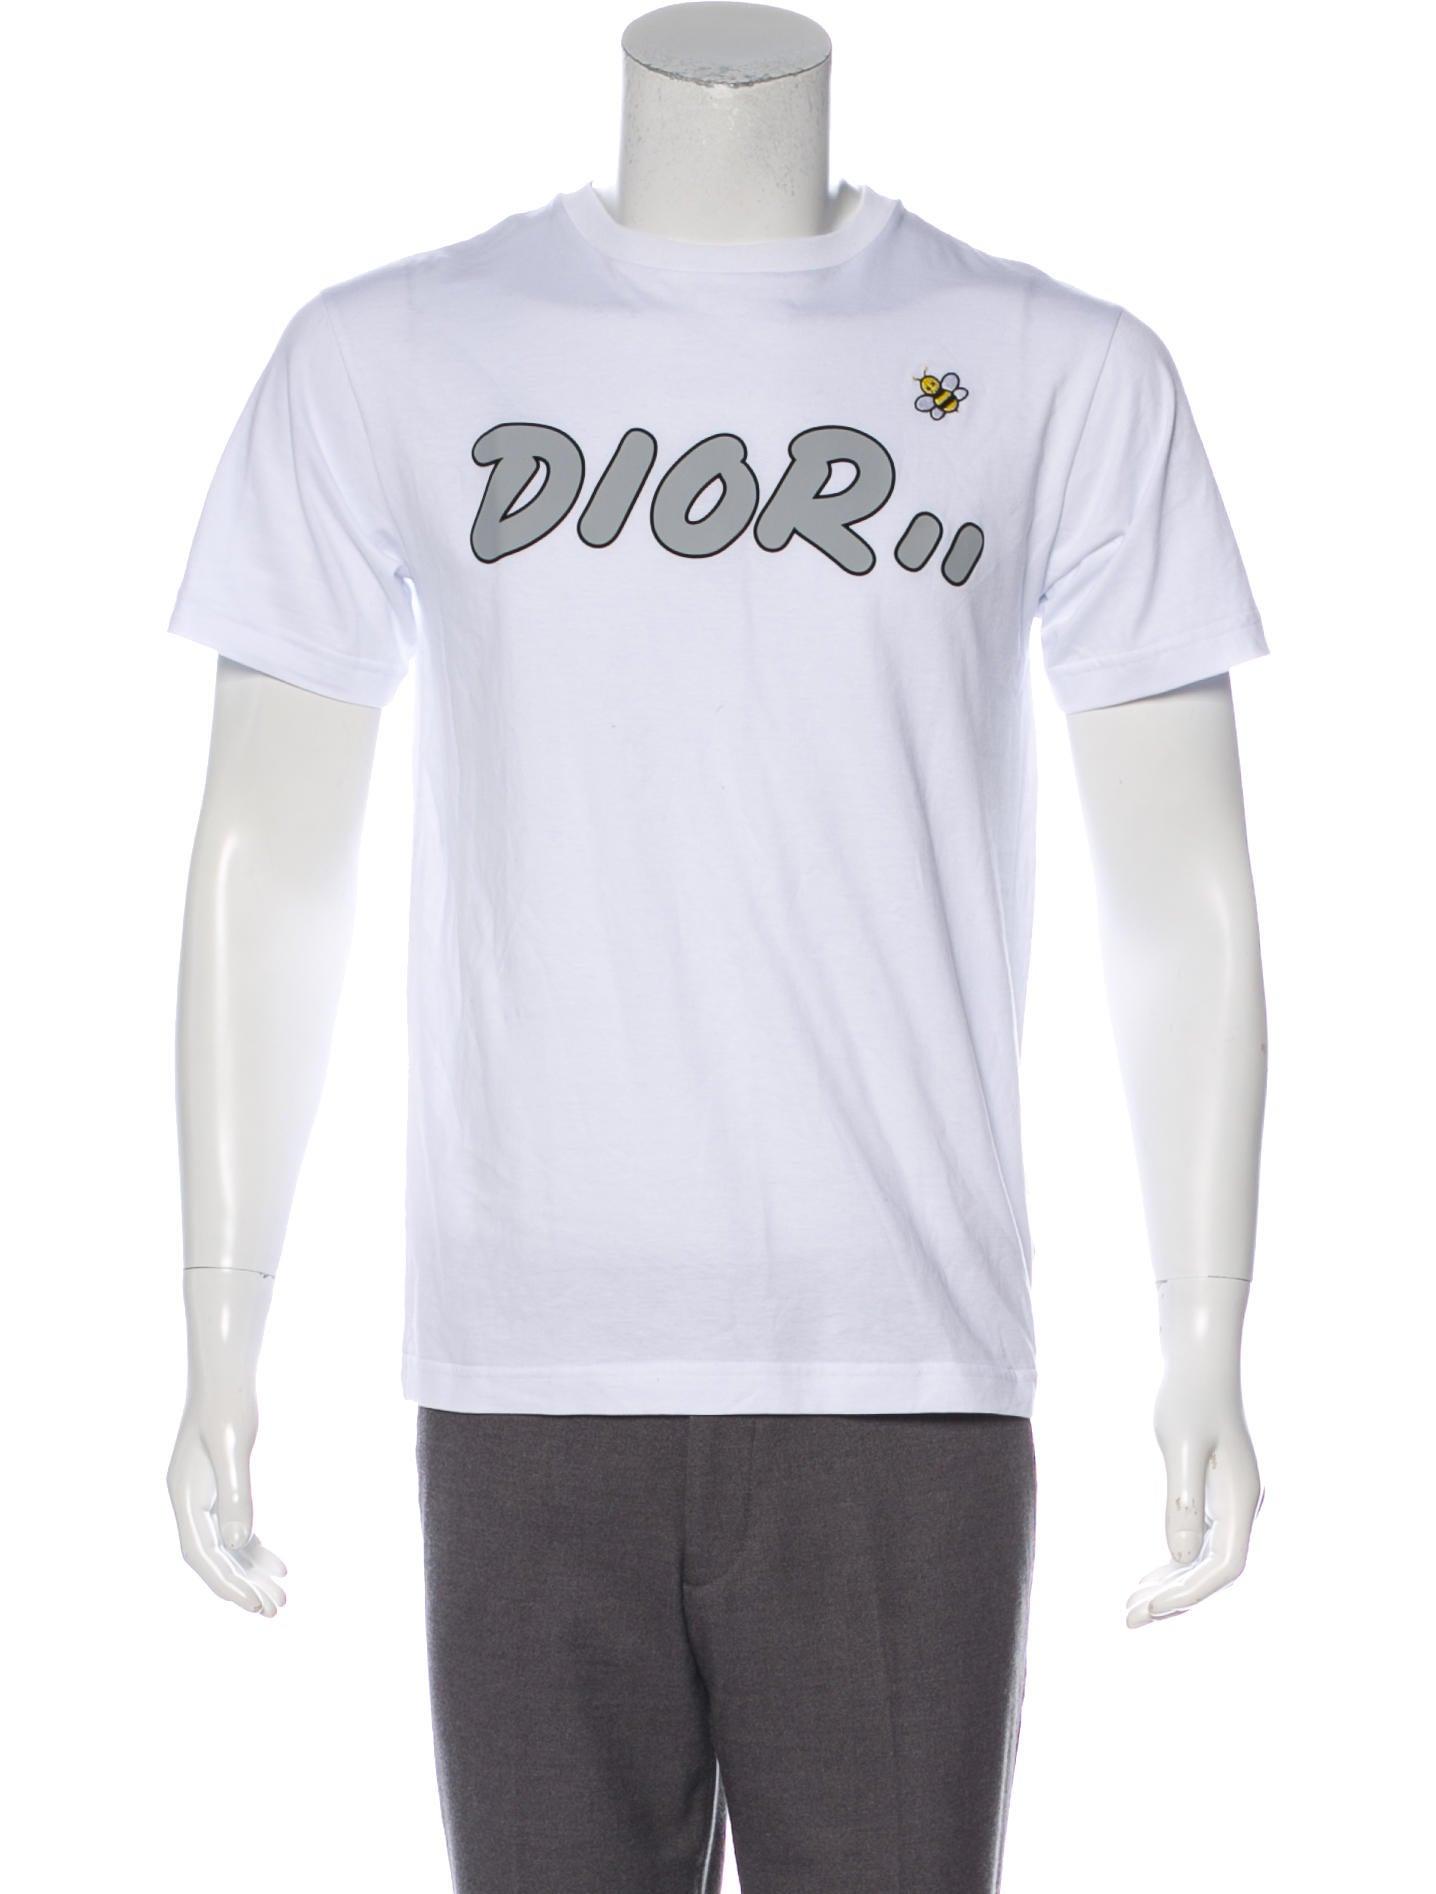 48f66ab3 Dior Homme x KAWS 2019 Logo Bee T-Shirt - Clothing - HMM26575 | The ...